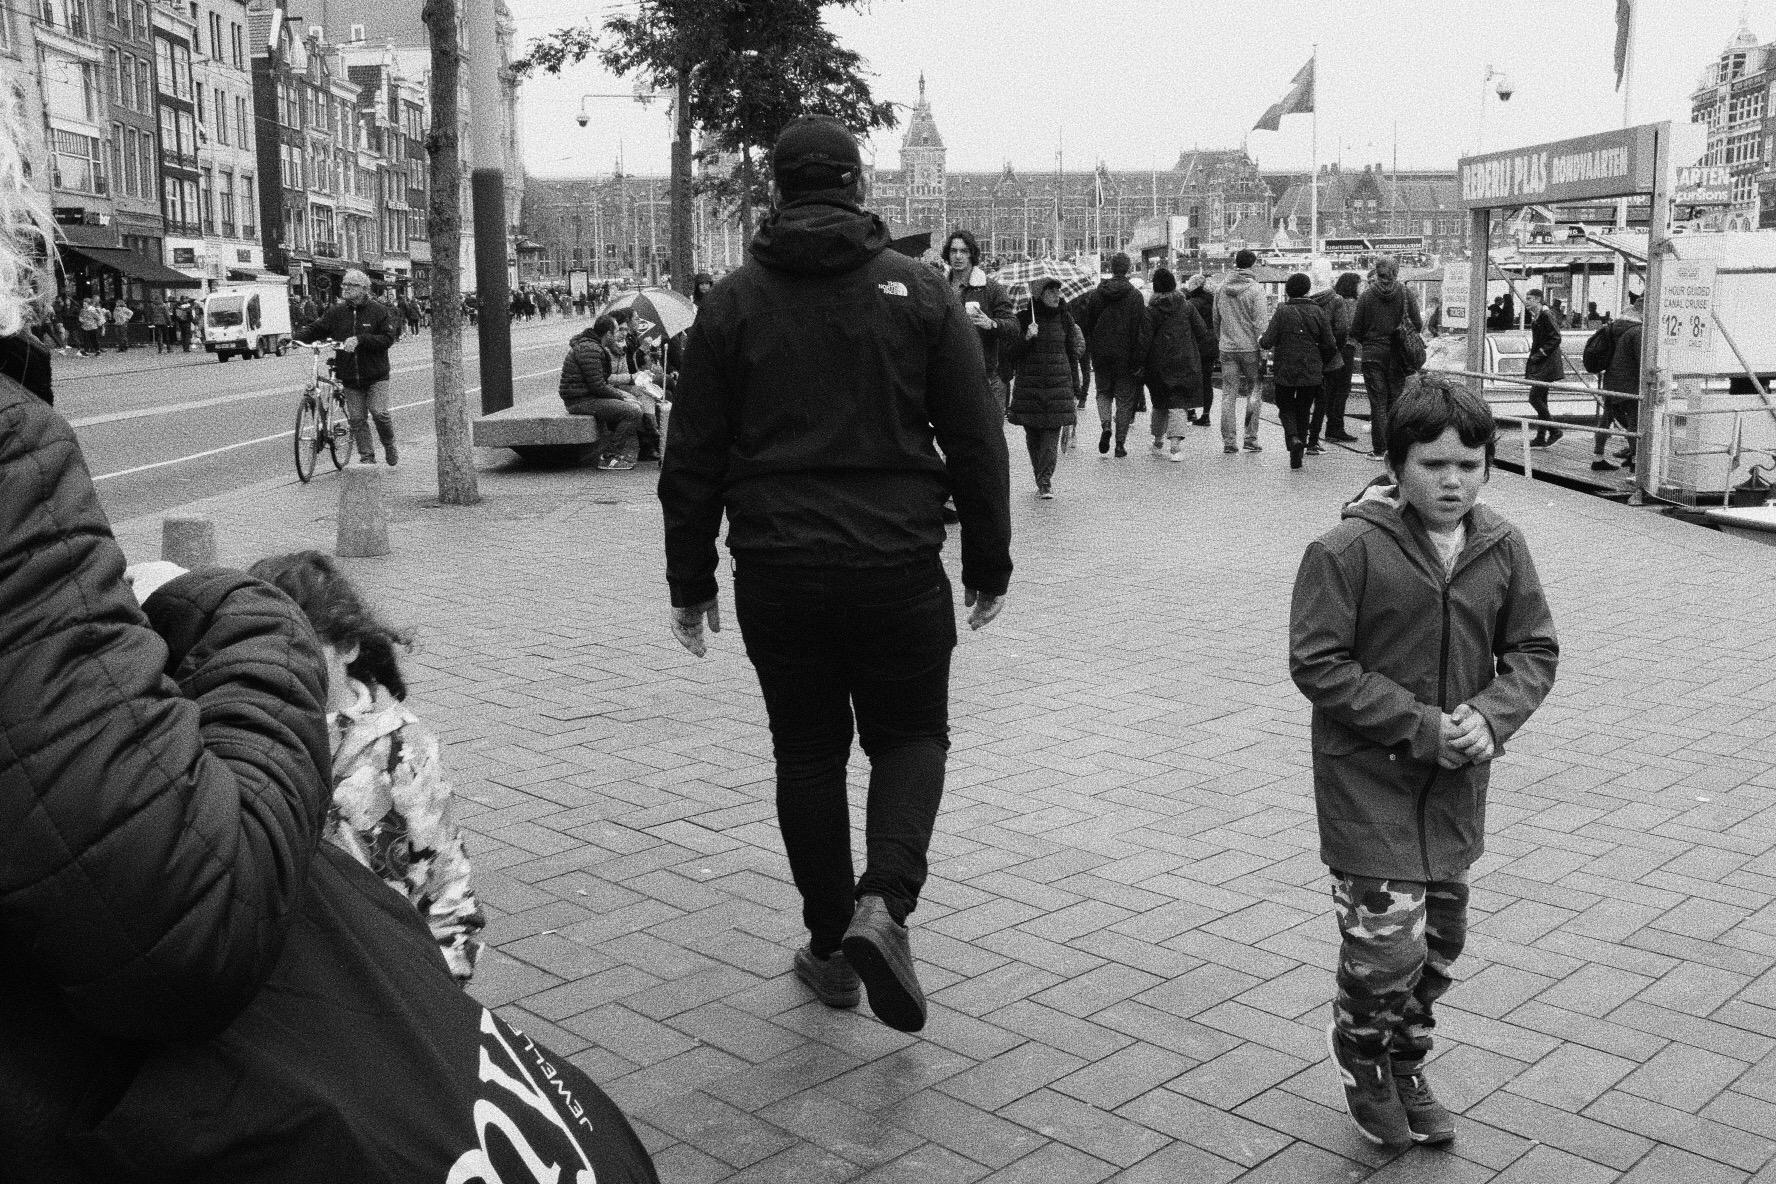 Amsterdam, Oct. 2019